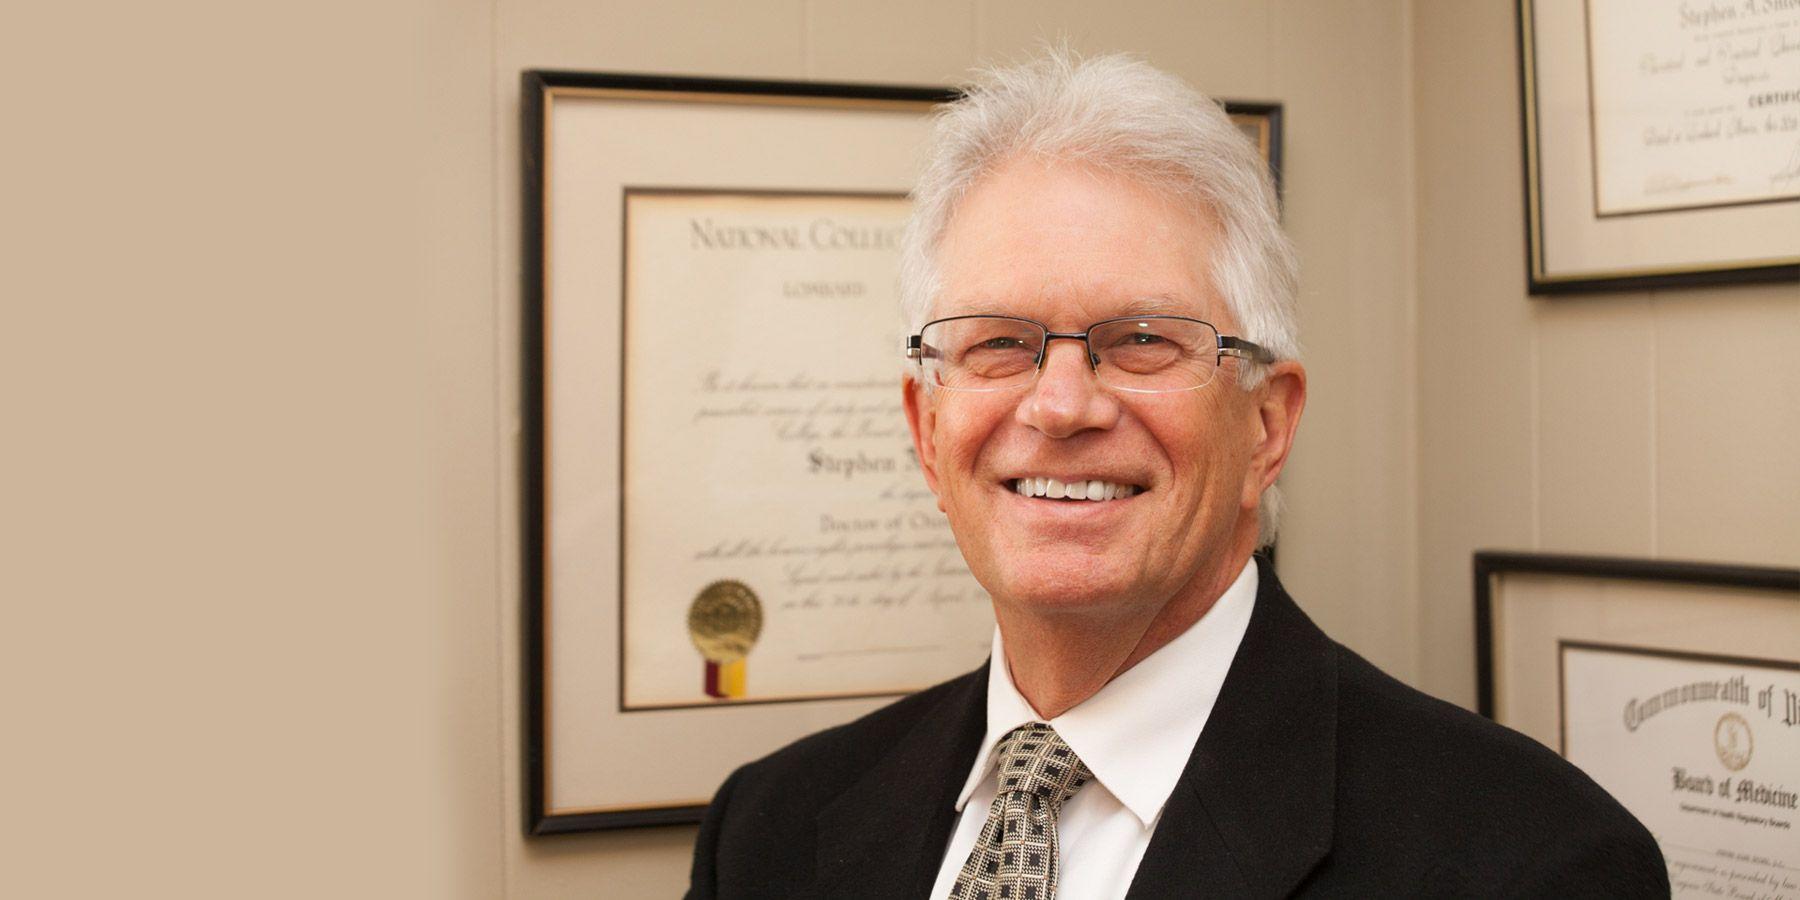 Dr. Stephen Snider